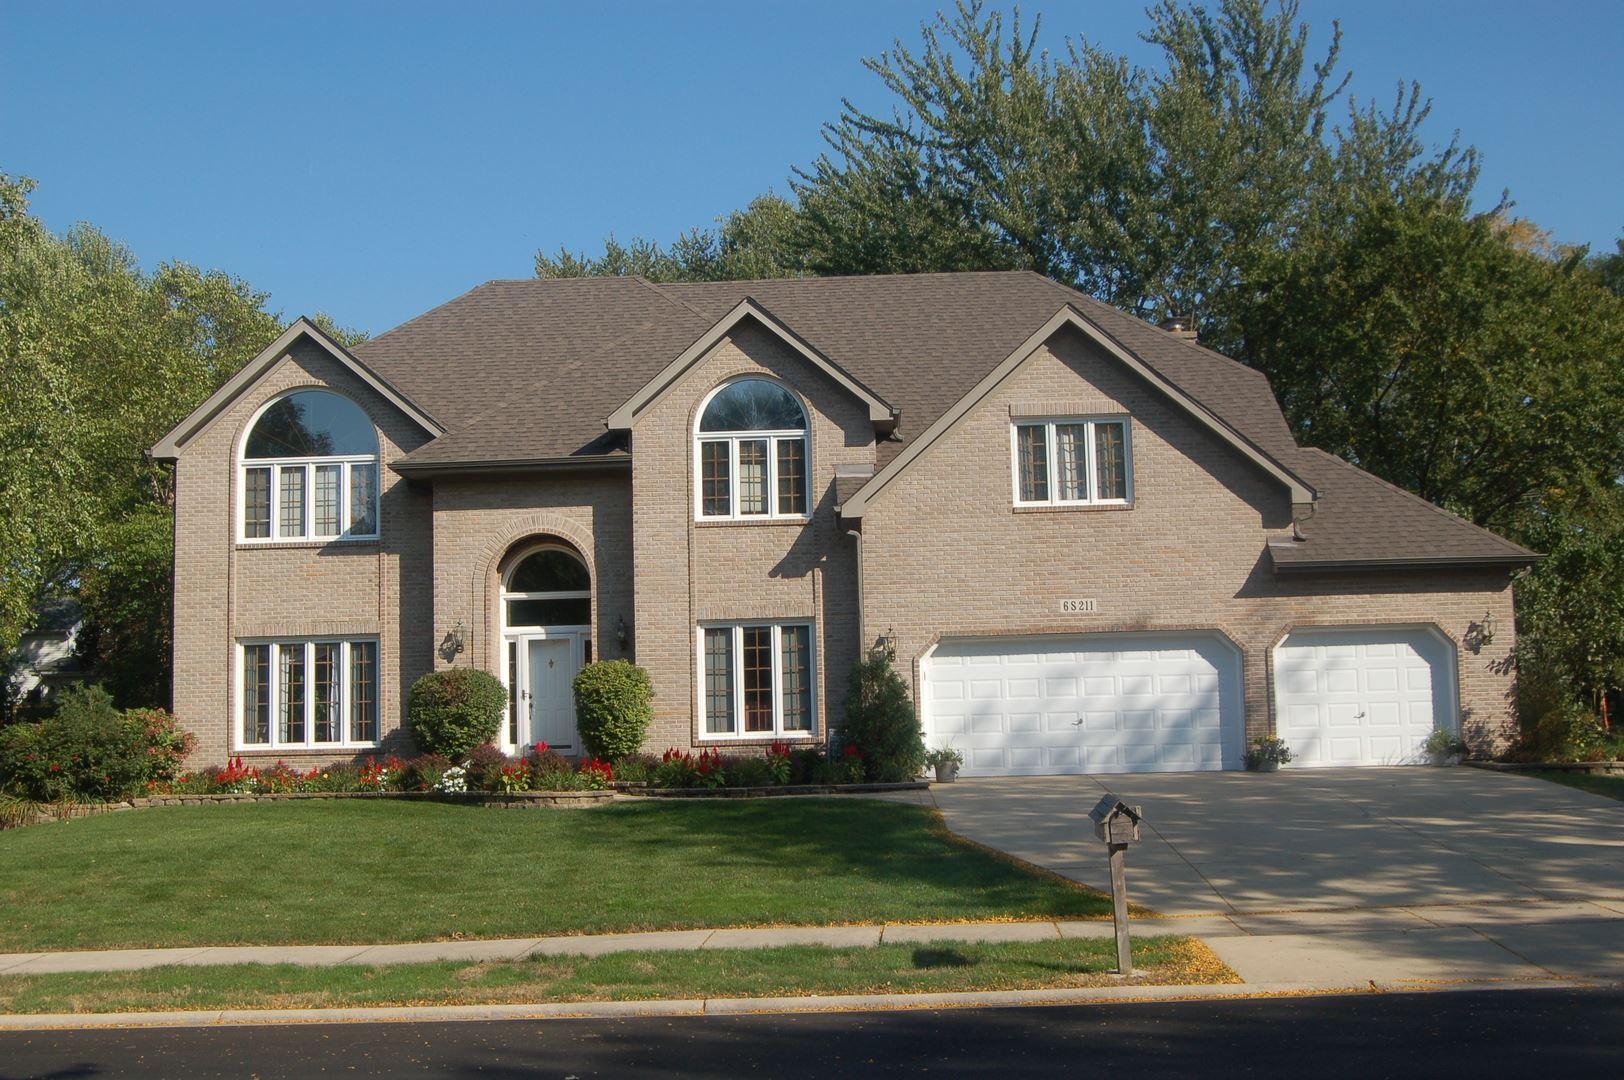 6S211 New Castle Road, Naperville, IL 60540 - #: 10883416